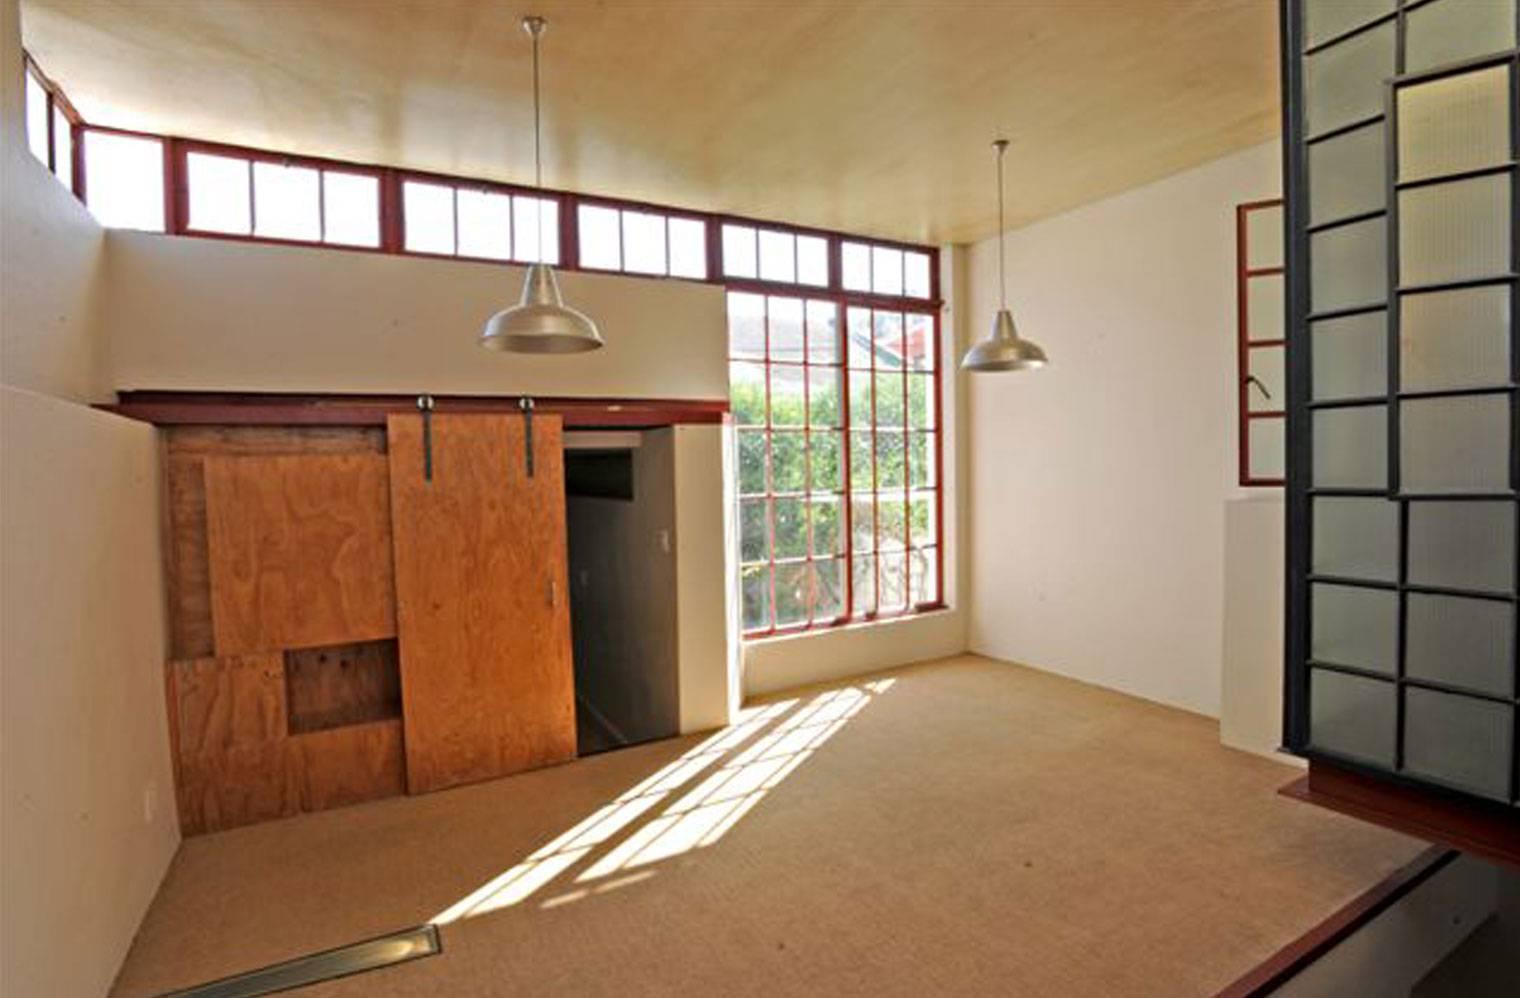 45 Leeuwen Street - Studio